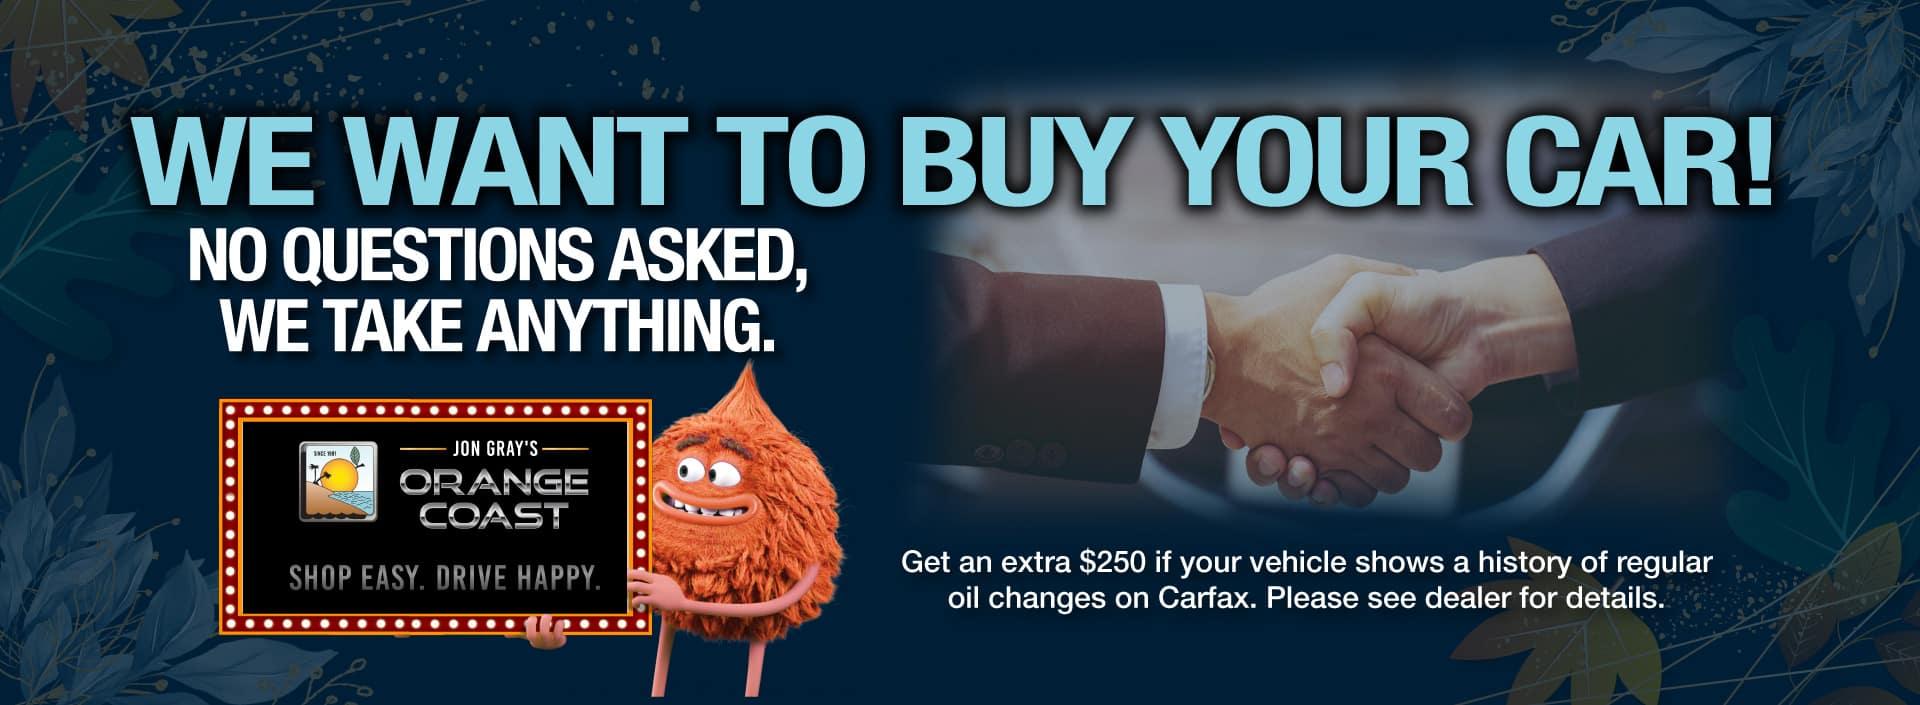 OC 1920px705 Offers_Sept30_We want ur Car